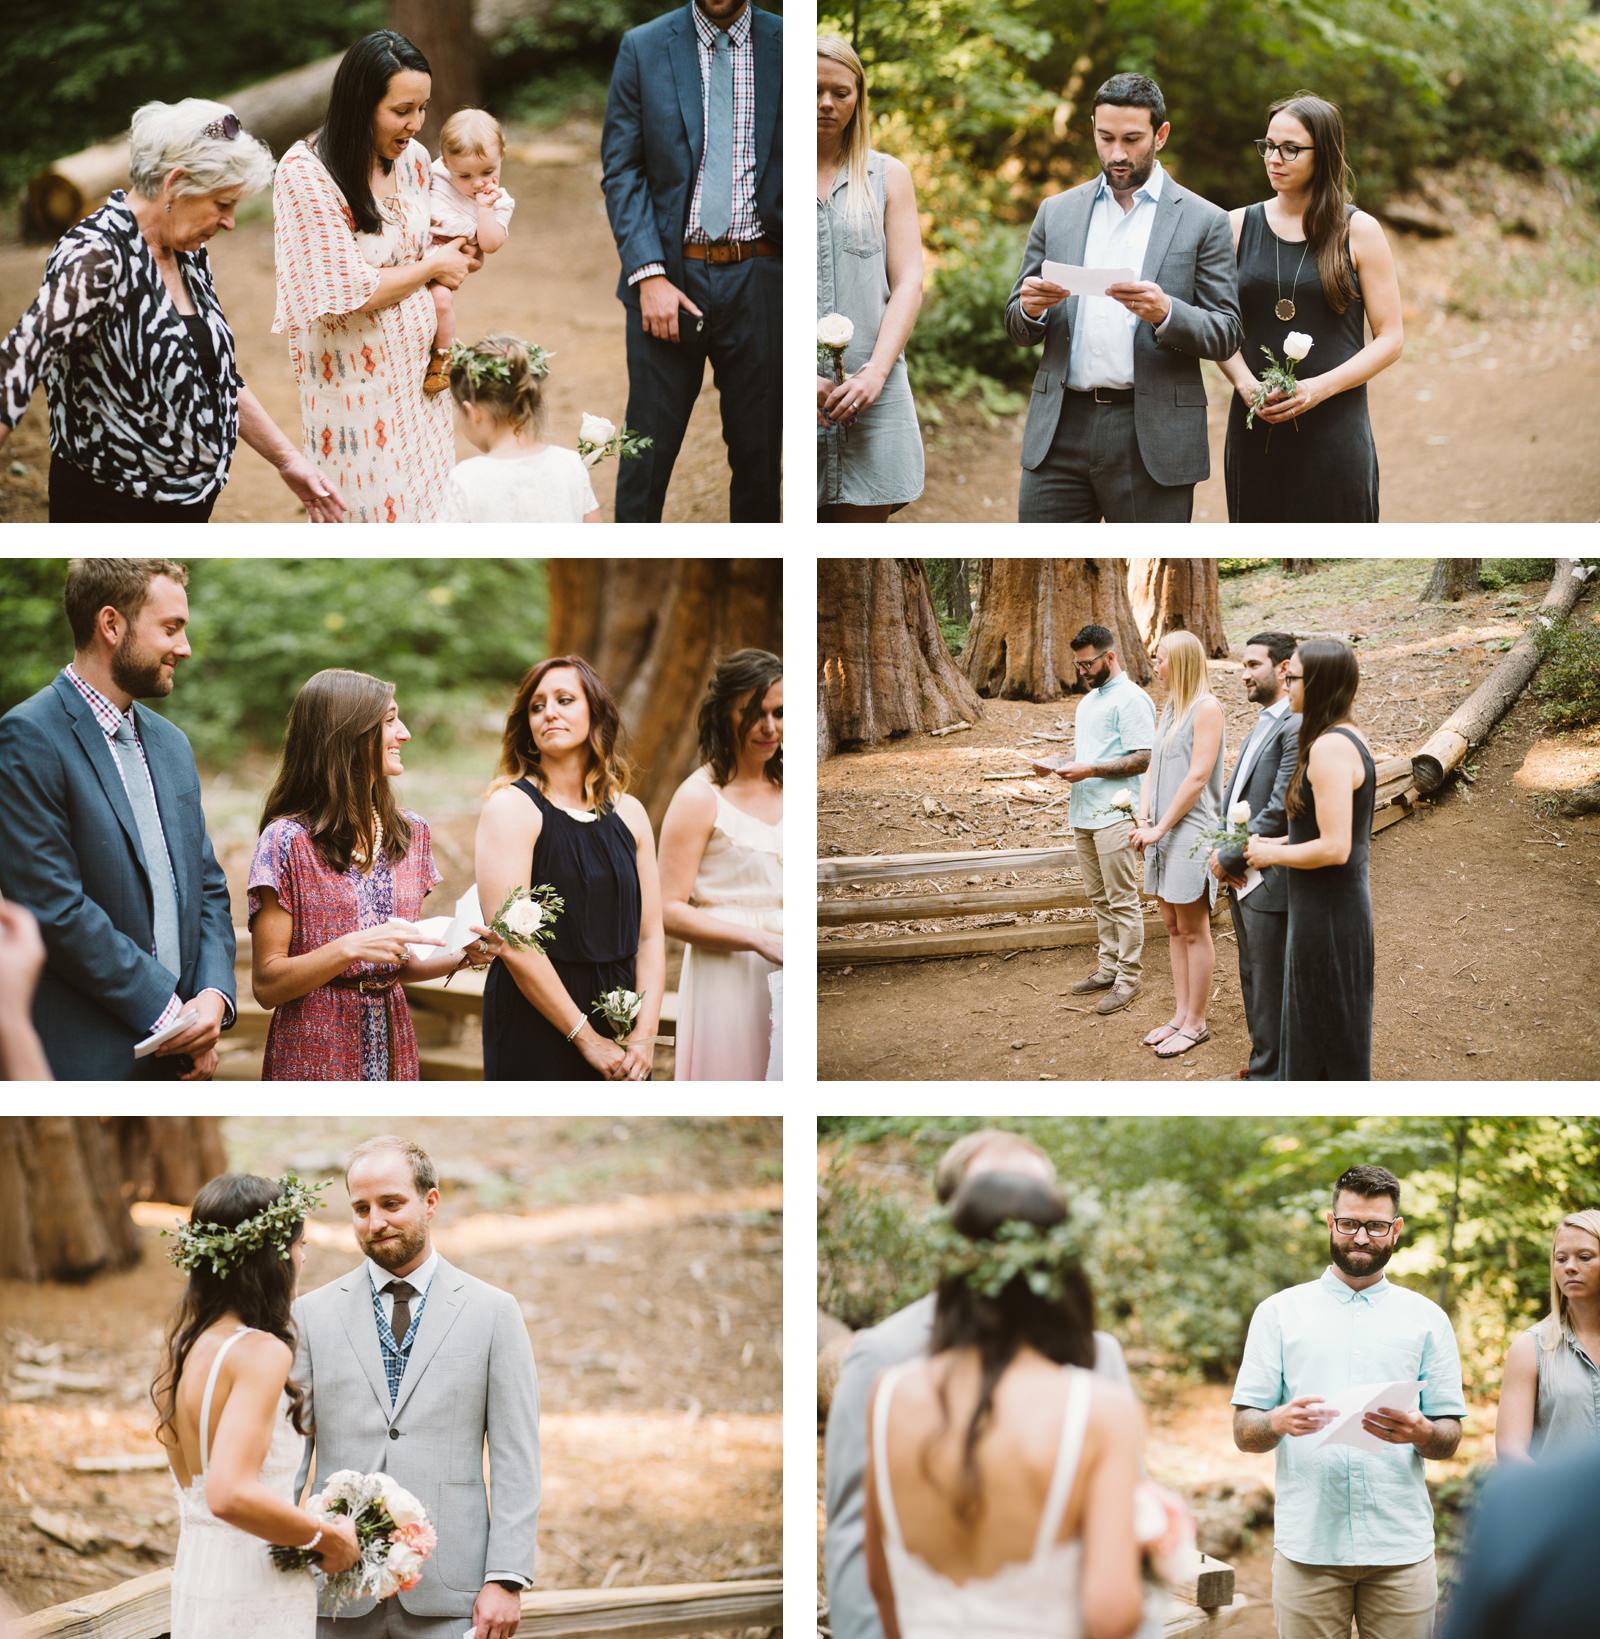 yosemite-intimate-wedding-047 YOSEMITE INTIMATE WEDDING